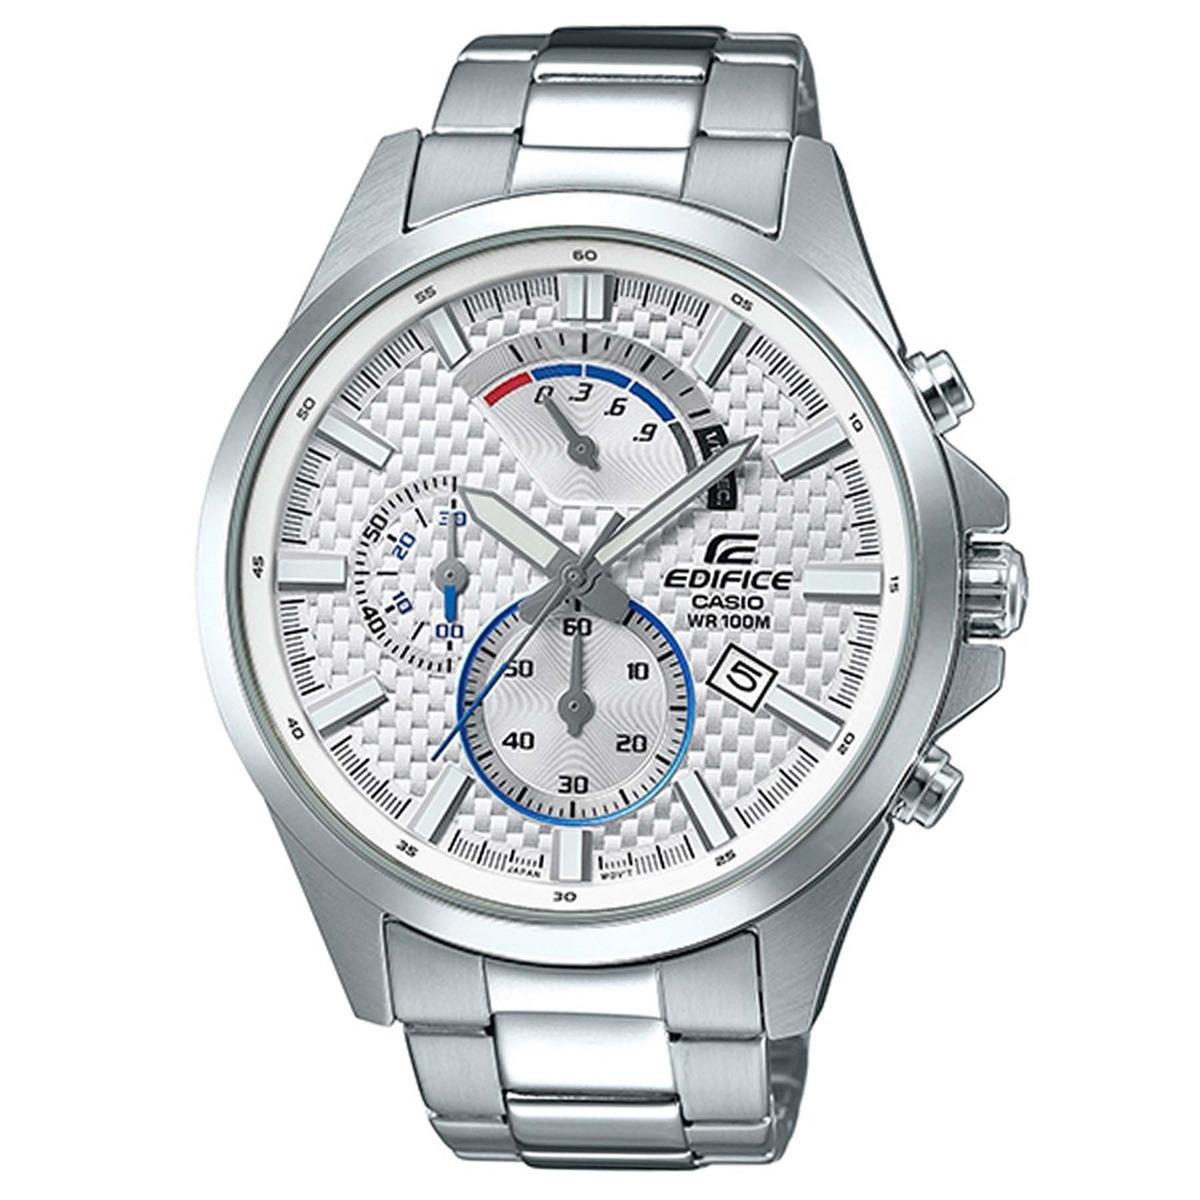 6c9338070b3 Relógio Casio Edifice Cronógrafo Masculino Analógico Efv-530 - R ...